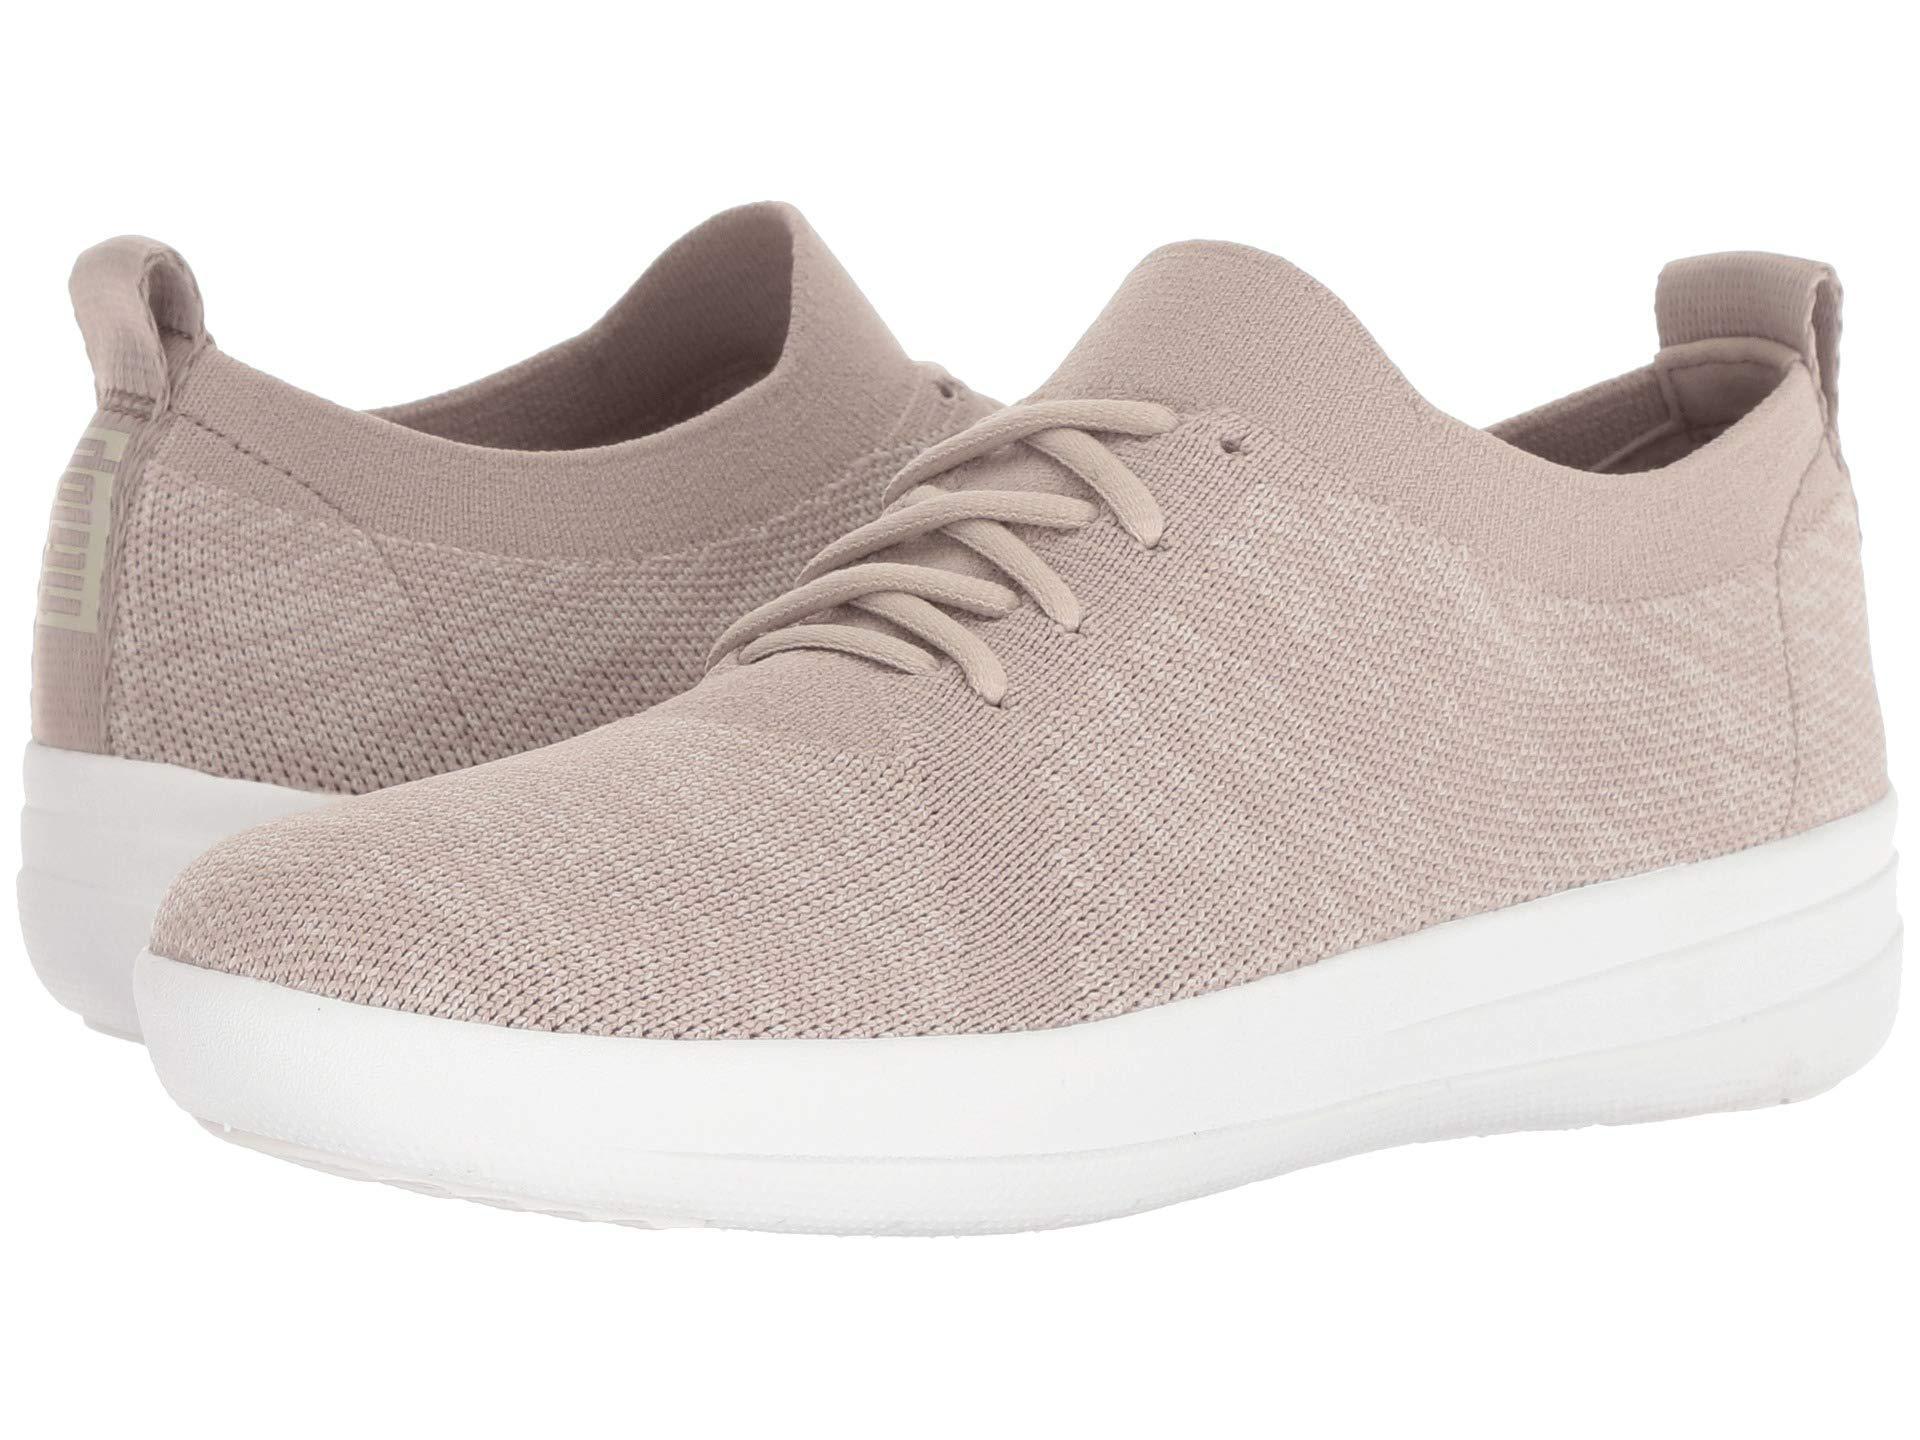 a78050e26577 Lyst - Fitflop F-sporty Uberknit Sneakers (dark Taupe Mix) Women s ...